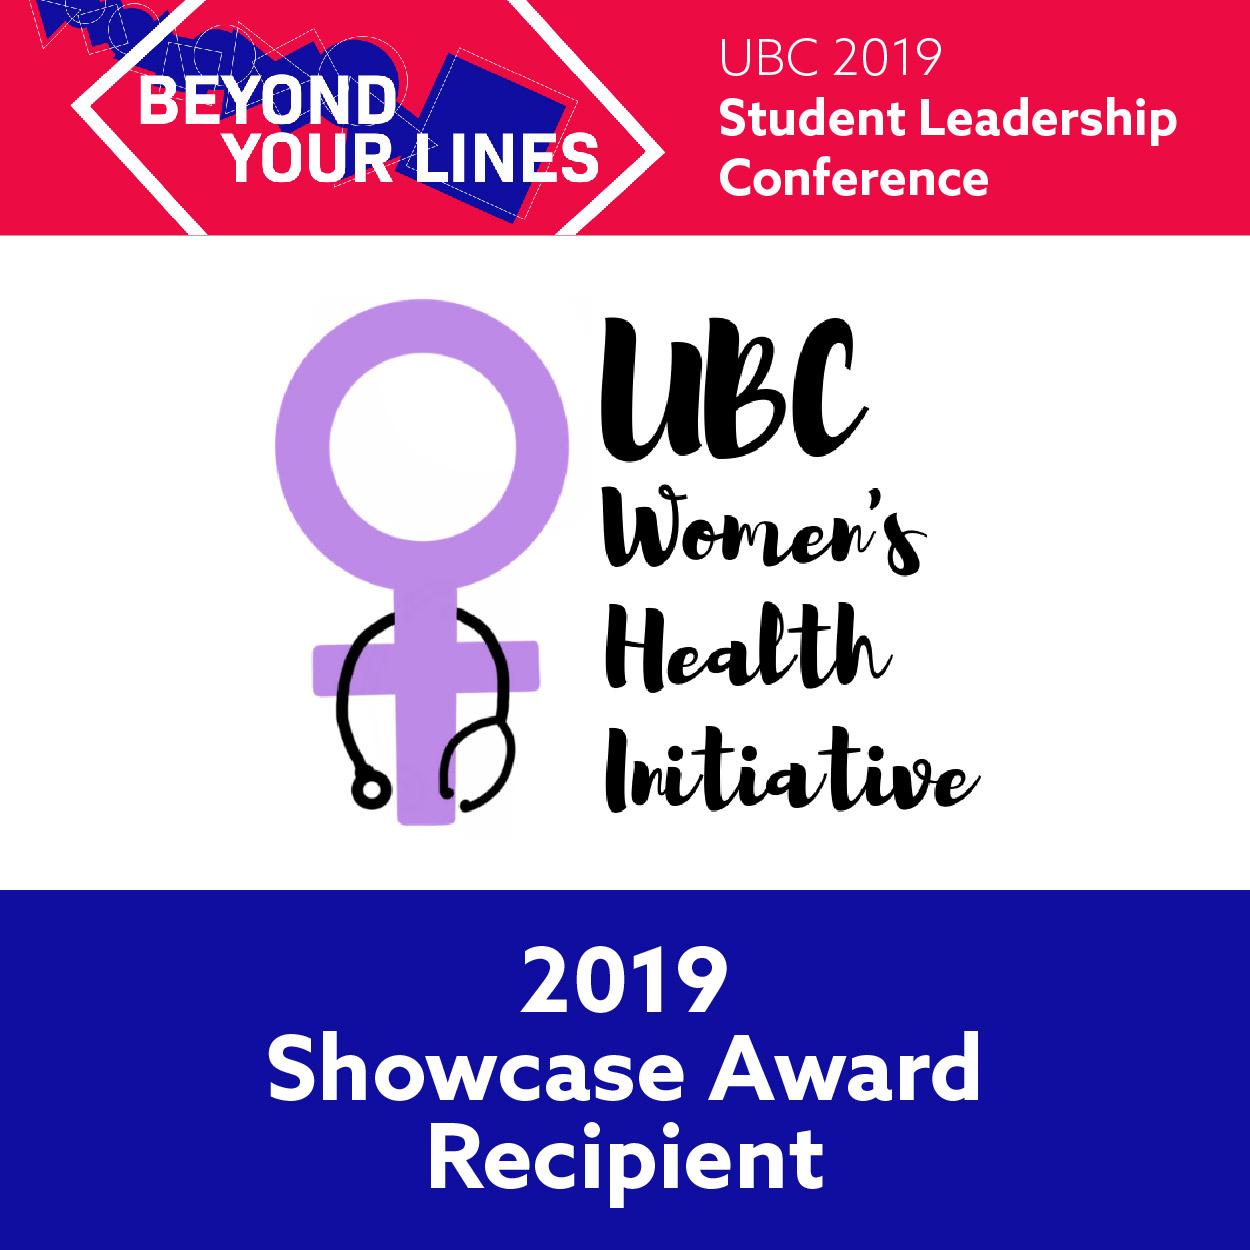 2019_SLC_Showcase award recepients-01.jpg